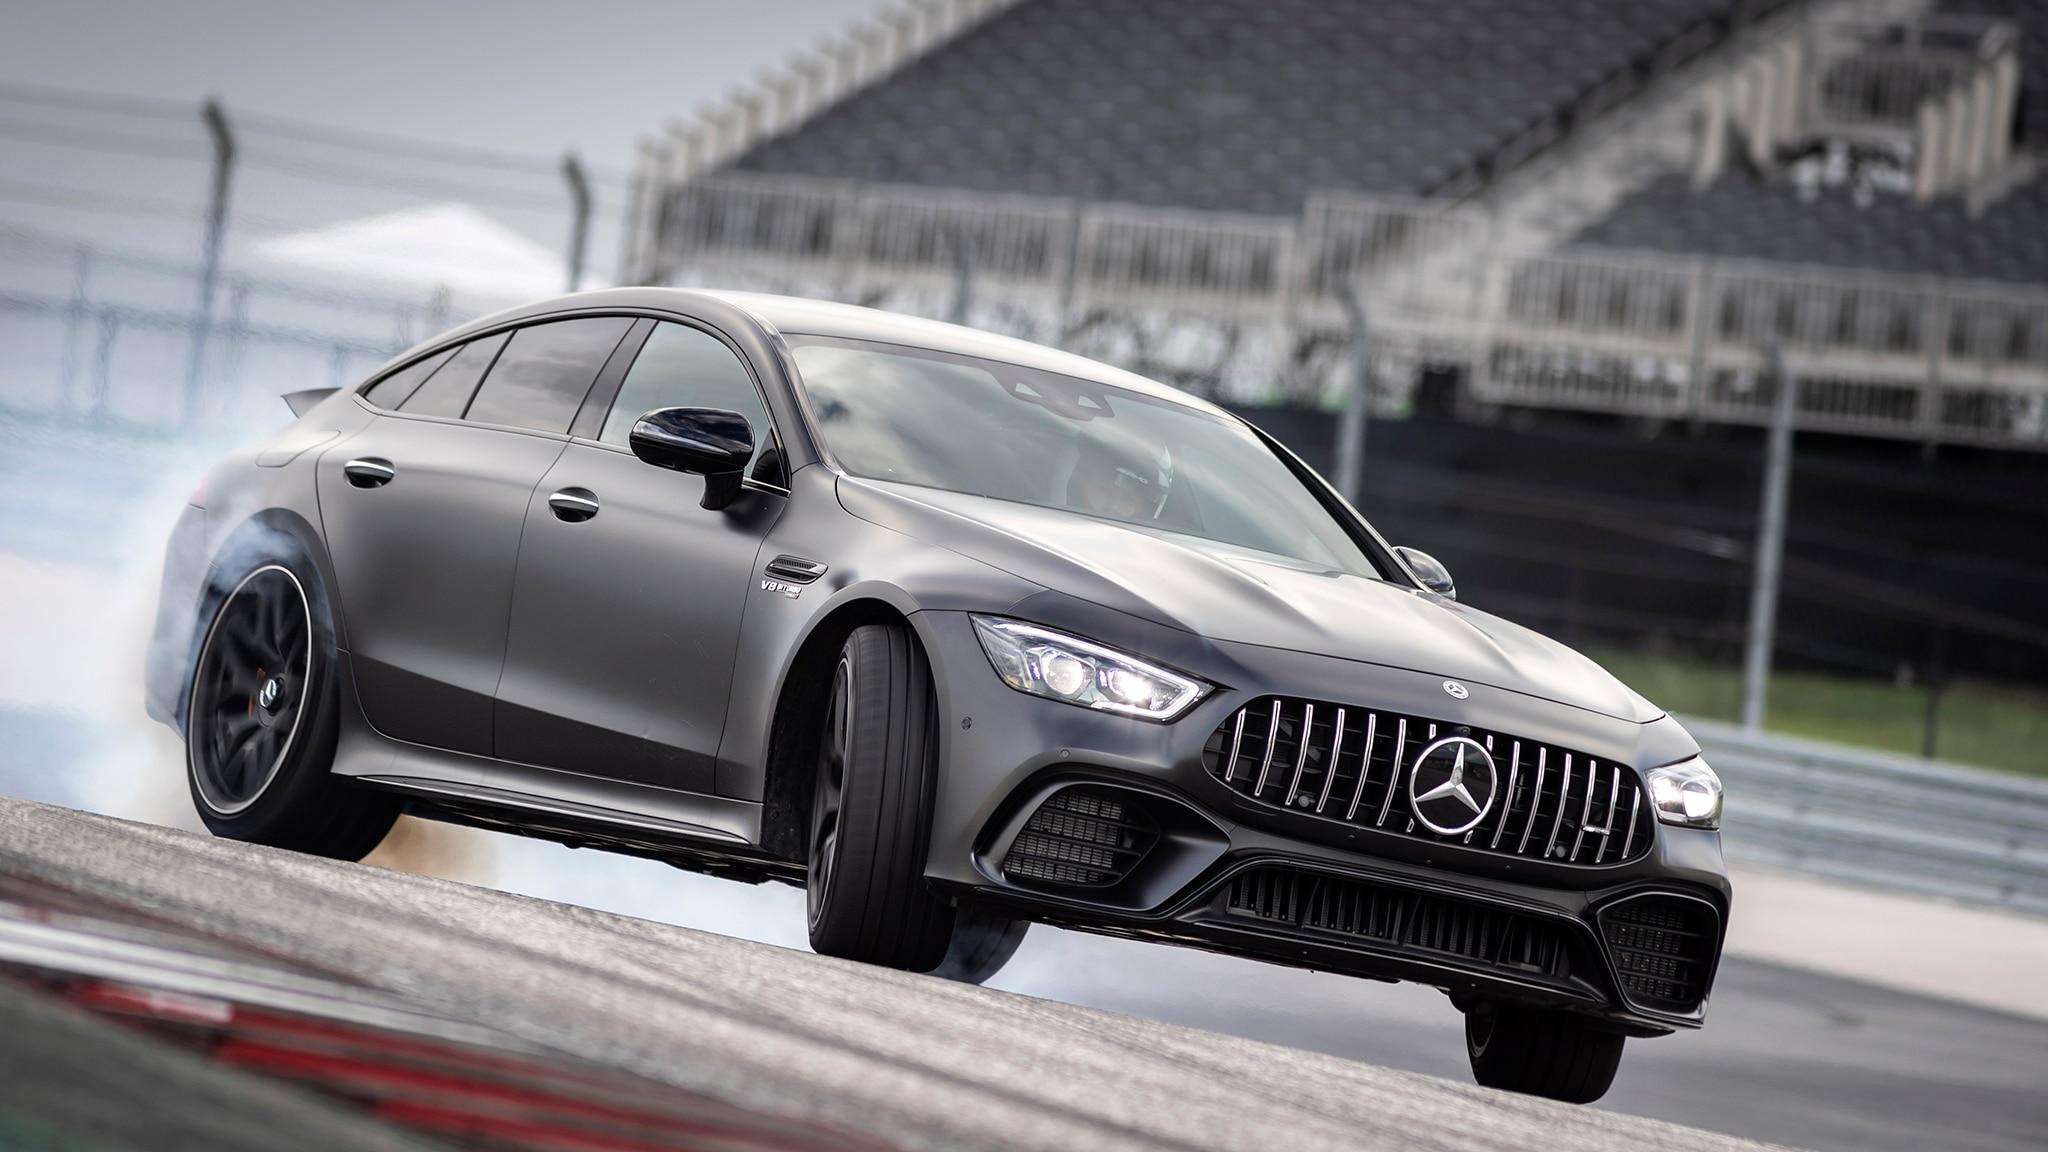 2019 Mercedes-AMG GT 4-Door First Drive Review ...